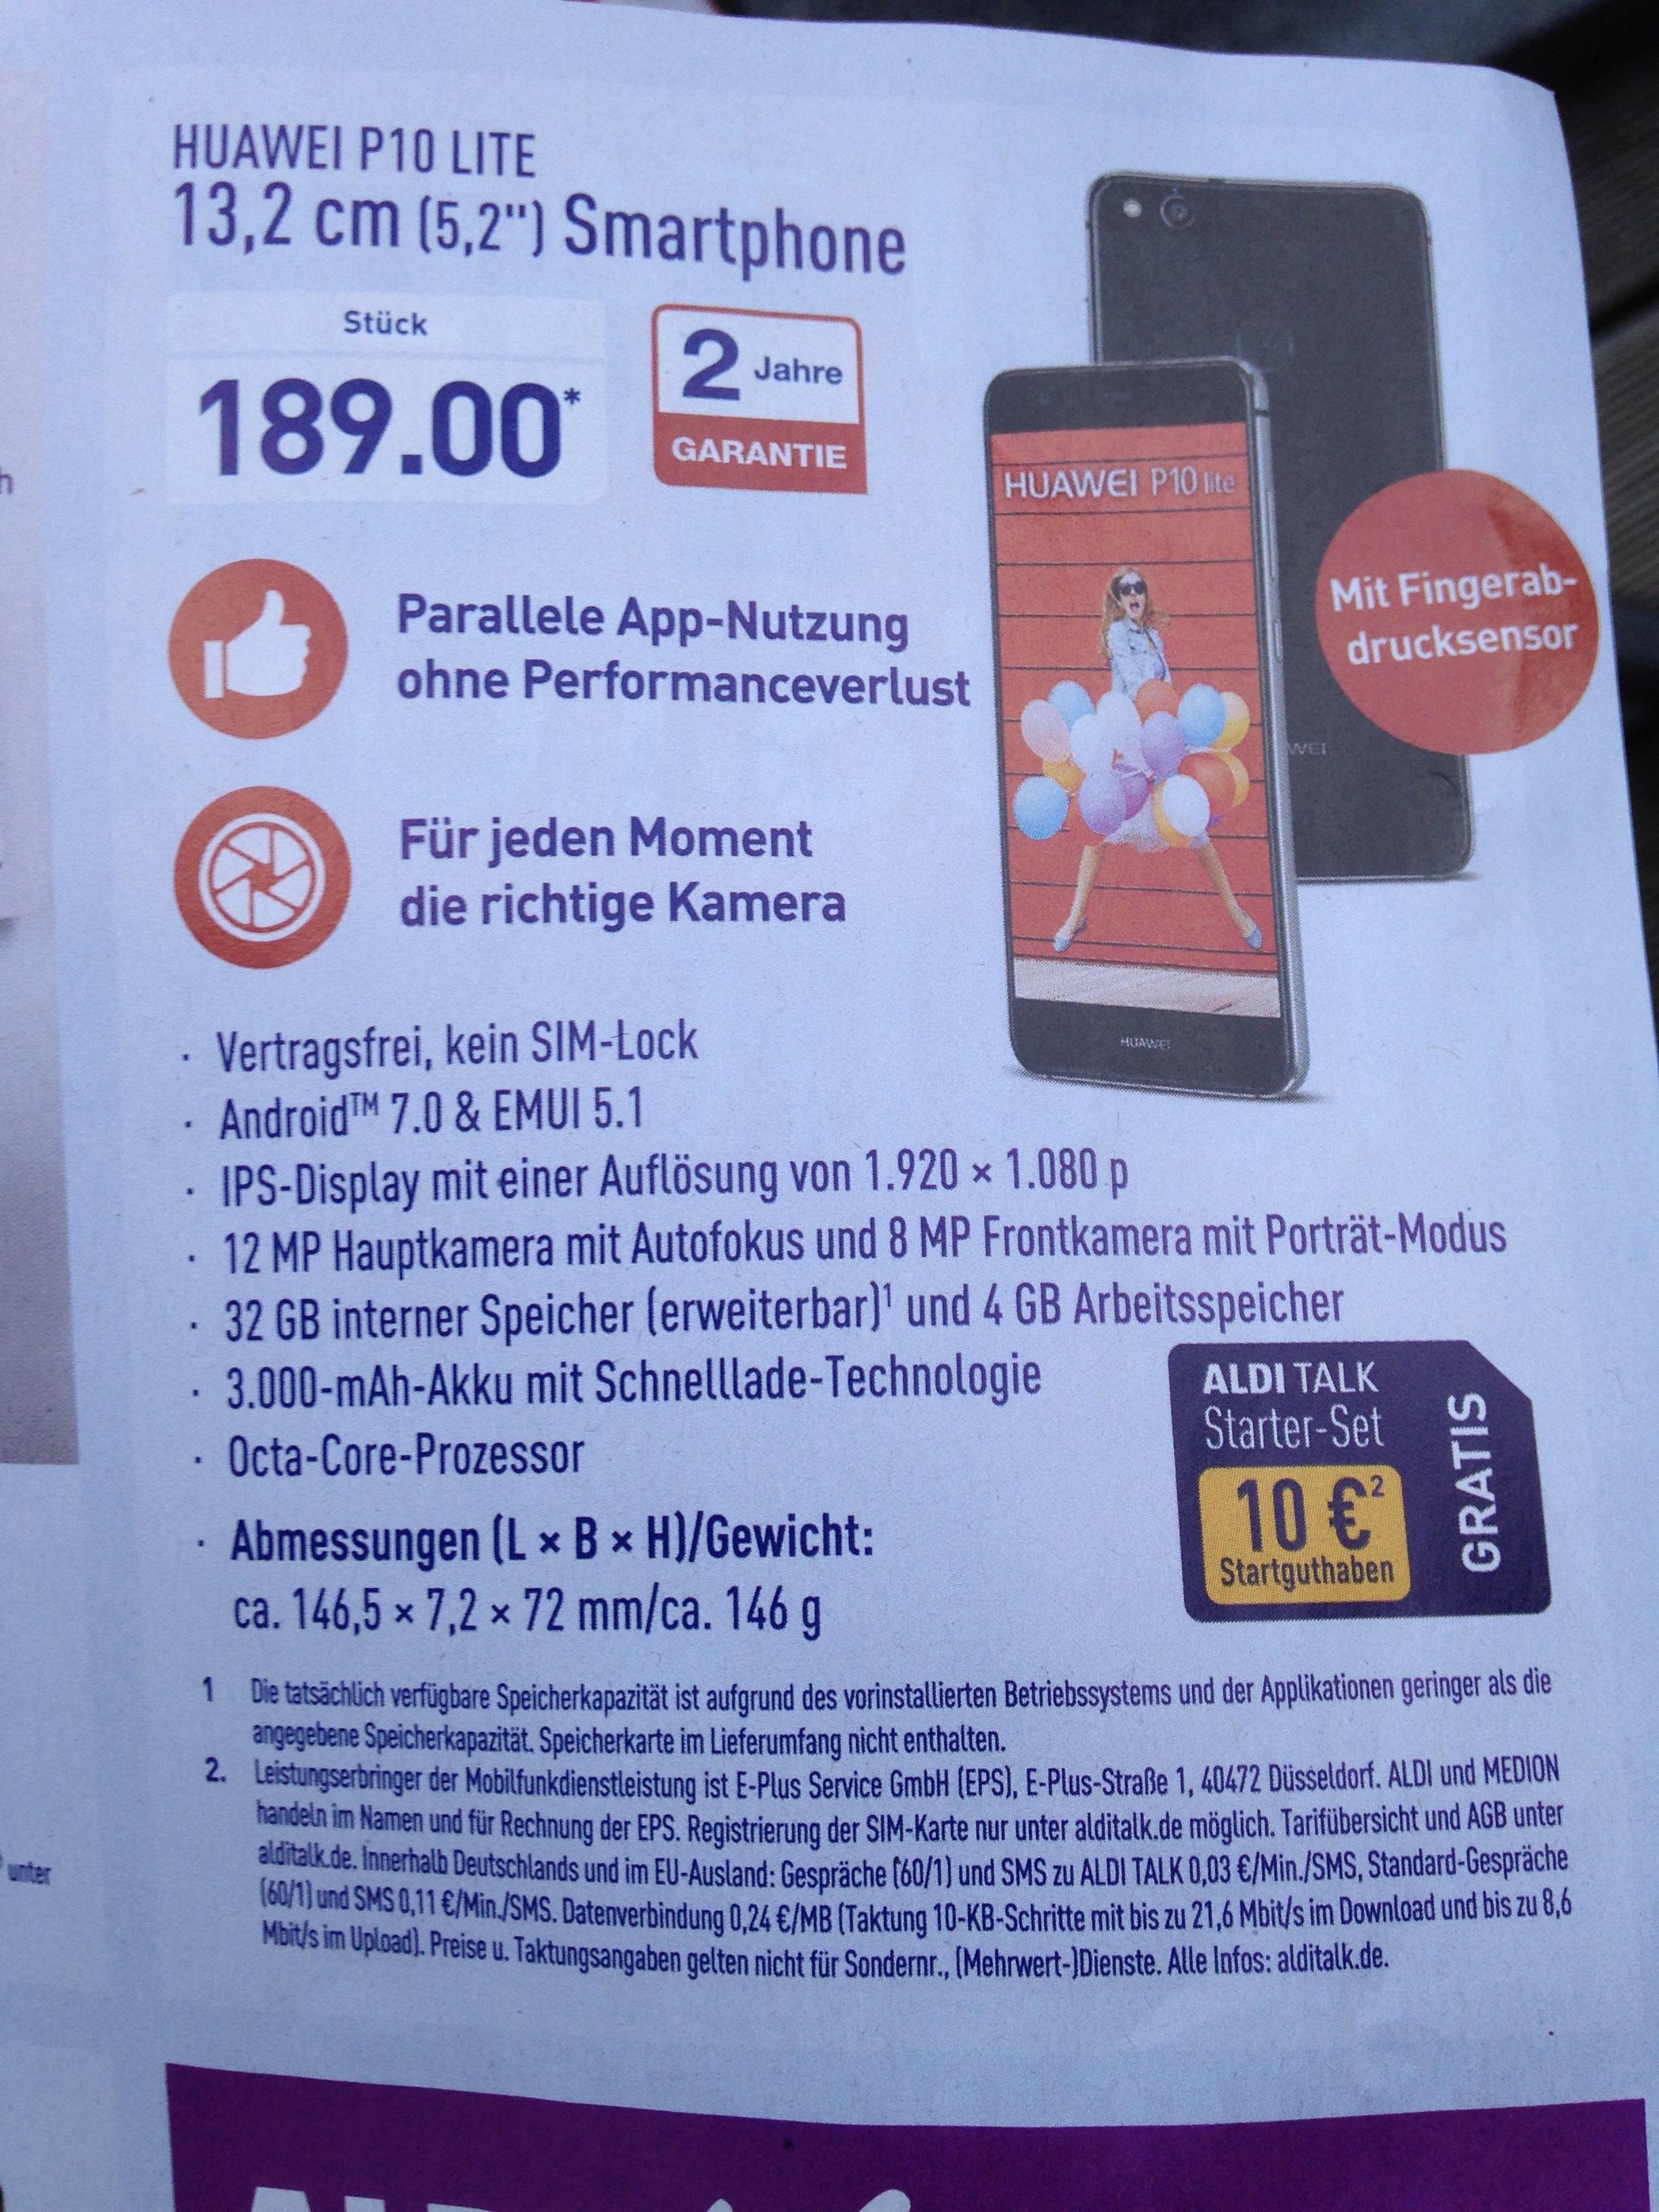 [Aldi Nord] 189,00 € Huawei P10 Lite bei Aldi (Nord)